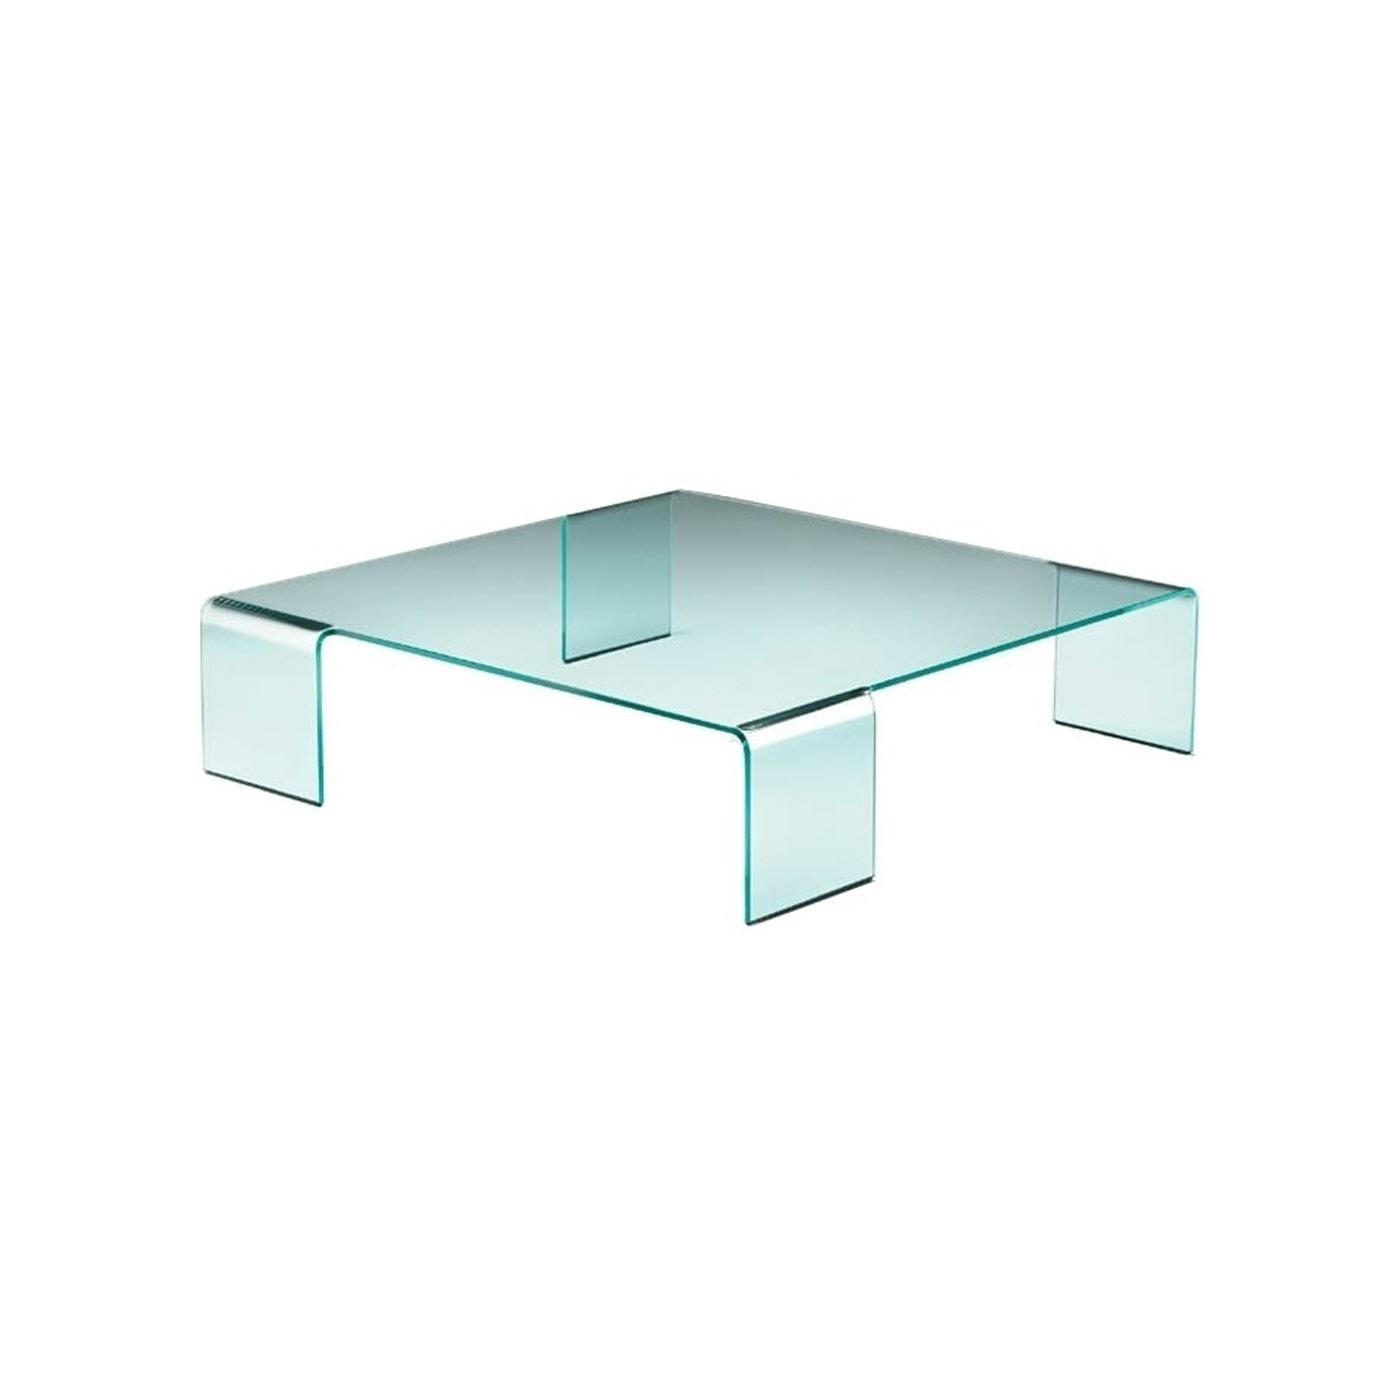 Neutra tavolo basso Fiam